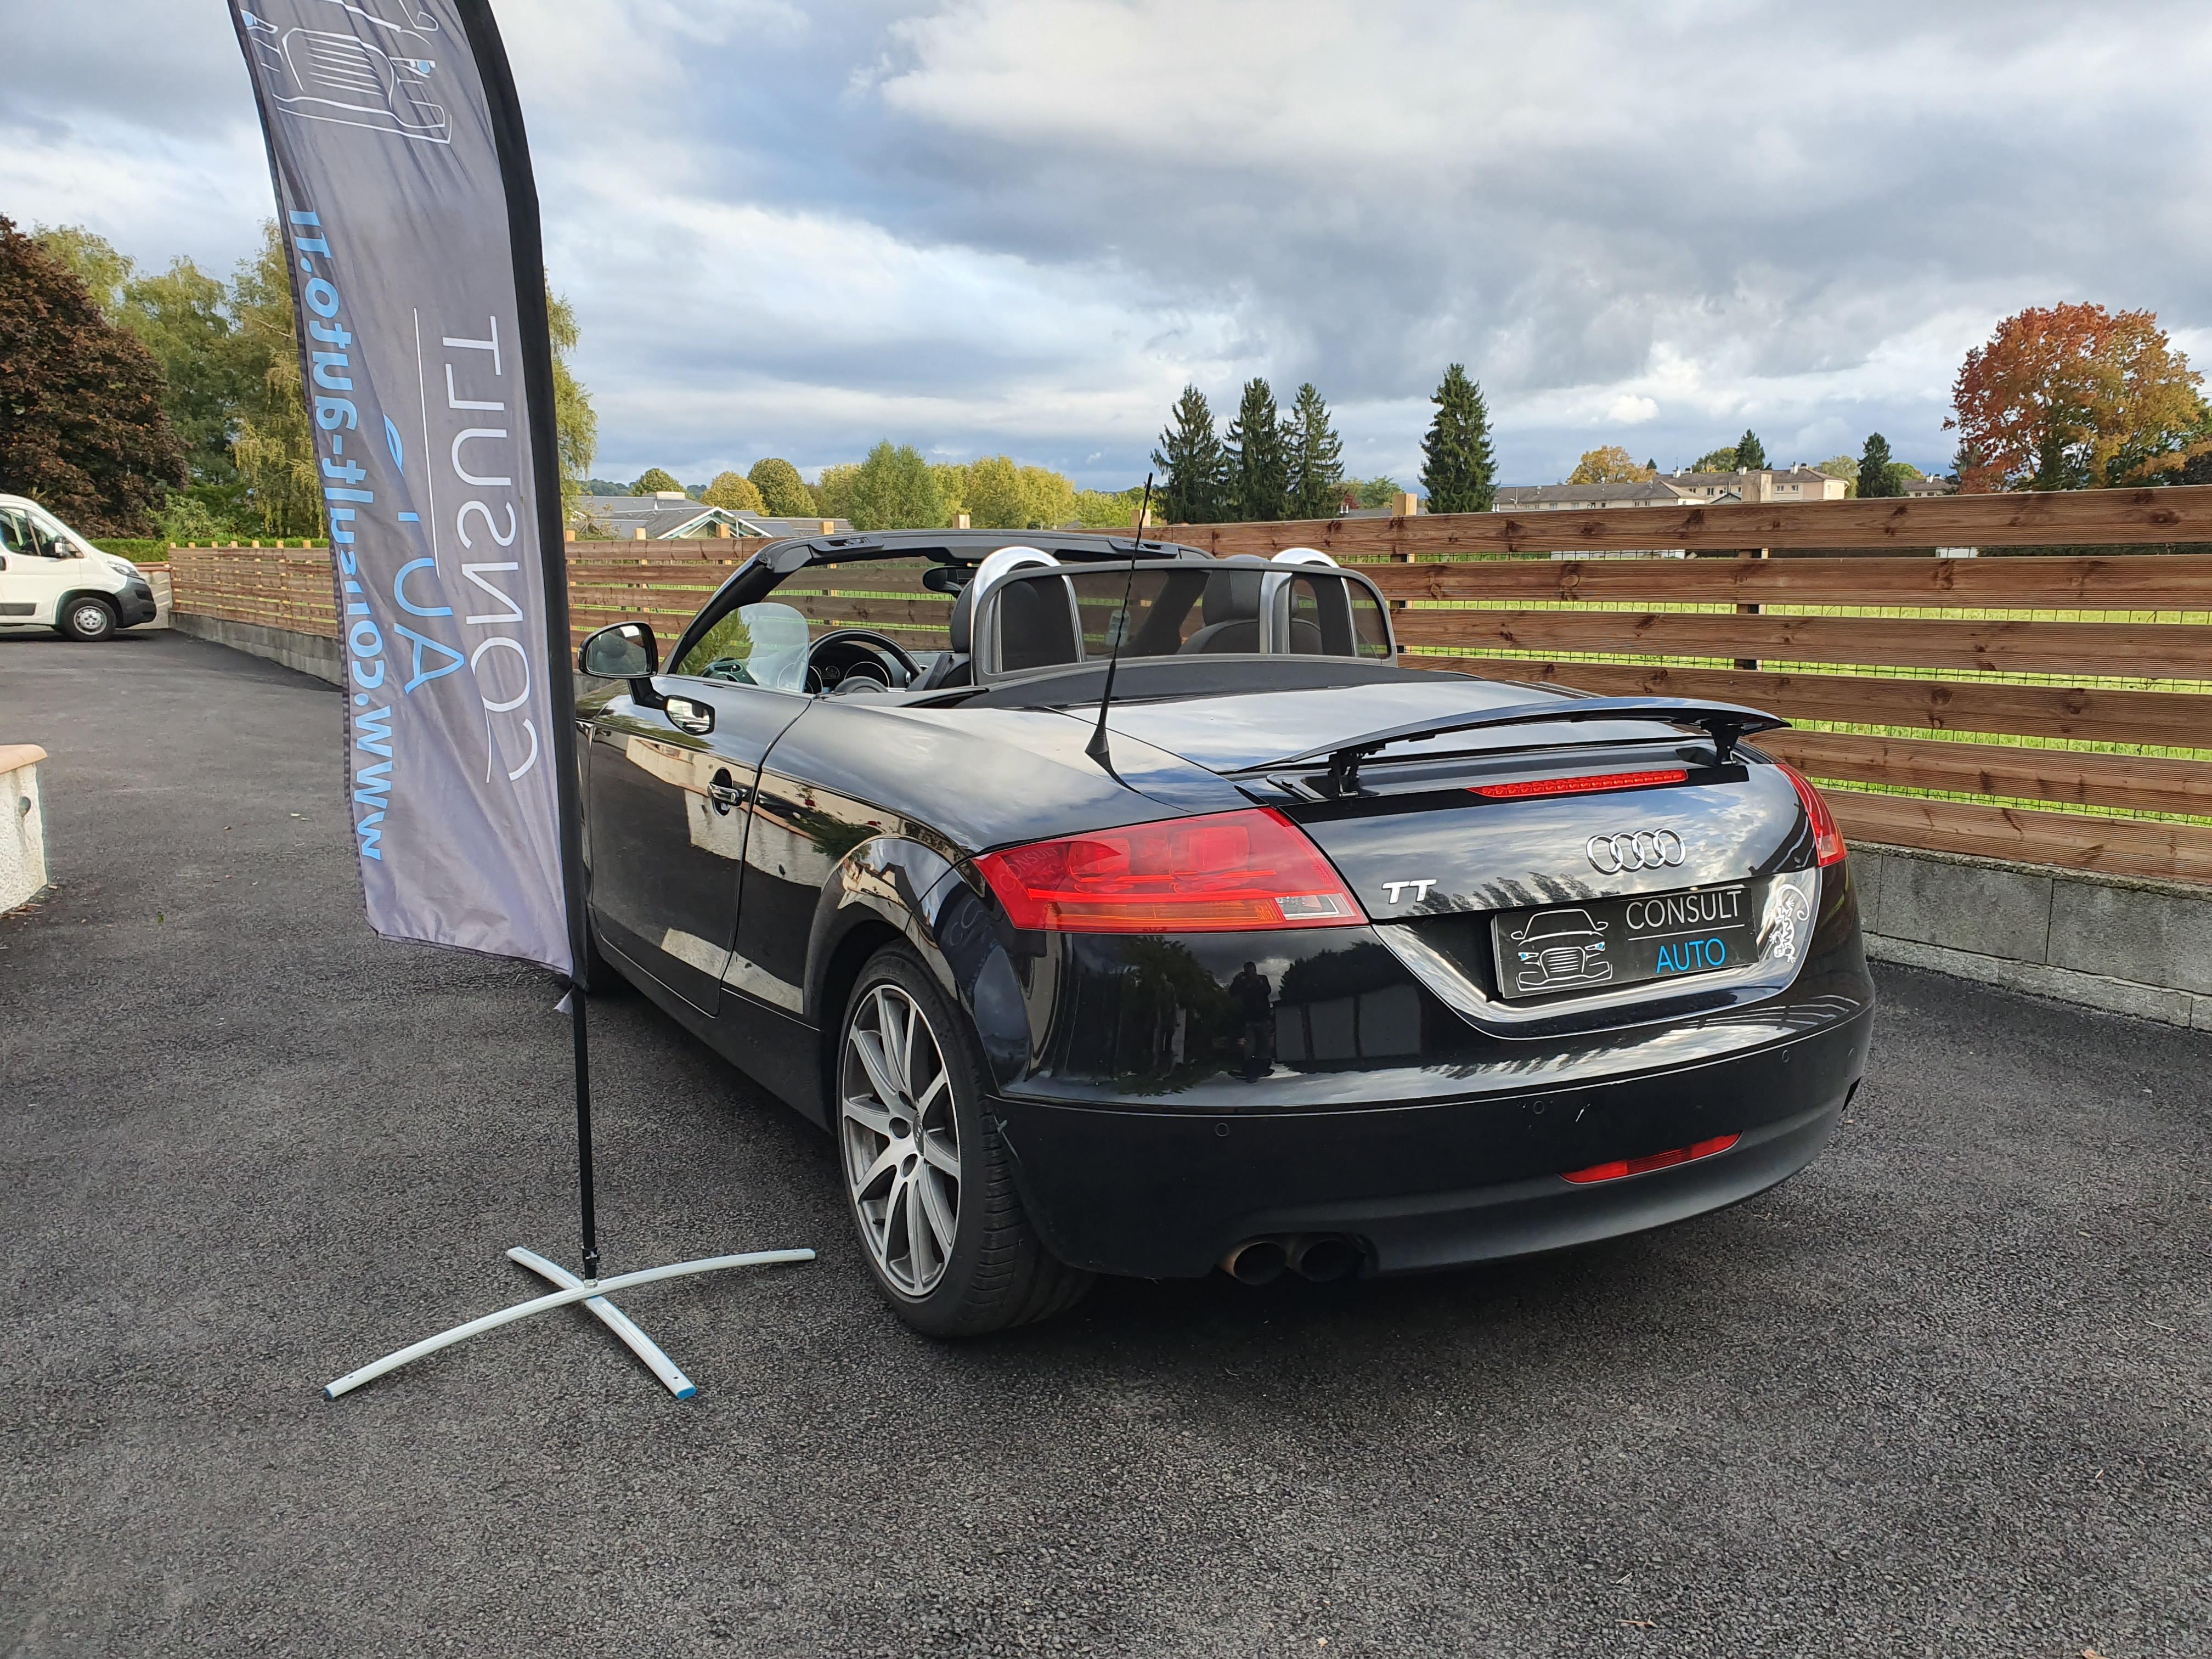 Audi TT II 2.0 TFSI 200 CV